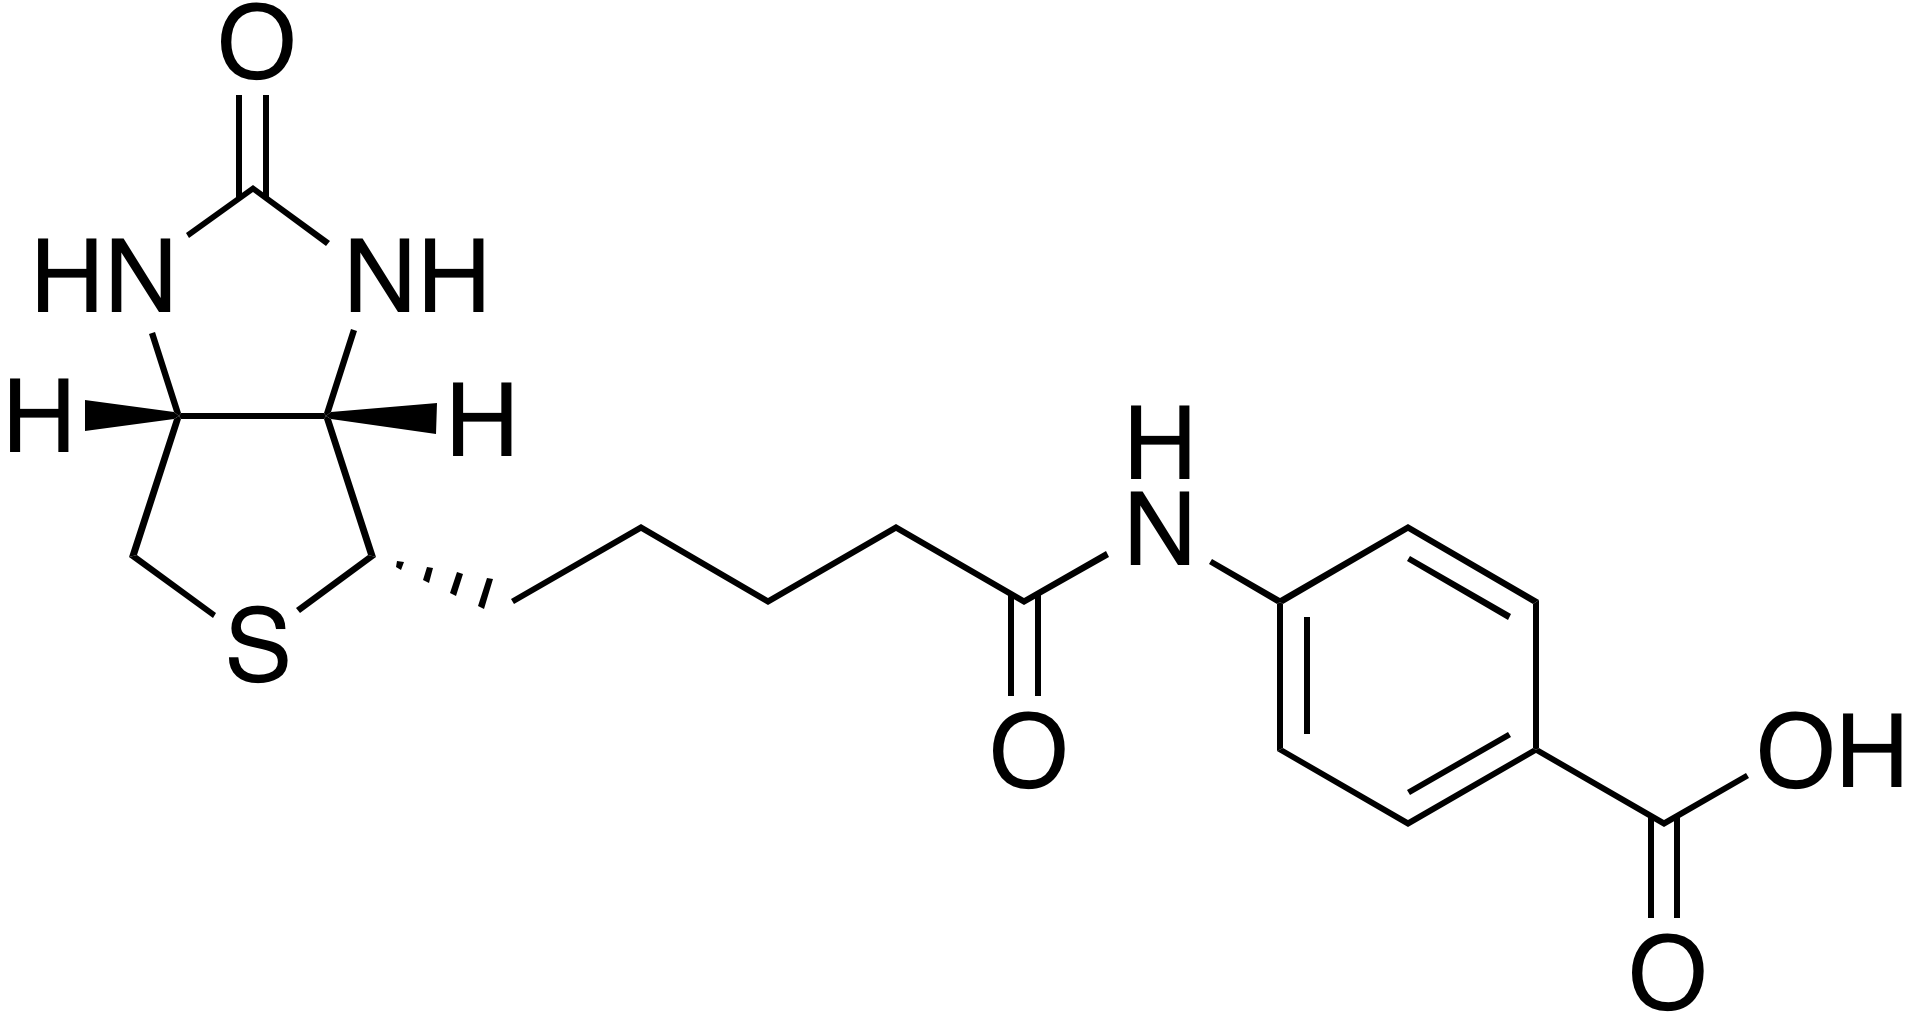 N-(+)-Biotinyl-4-aminobenzoic acid